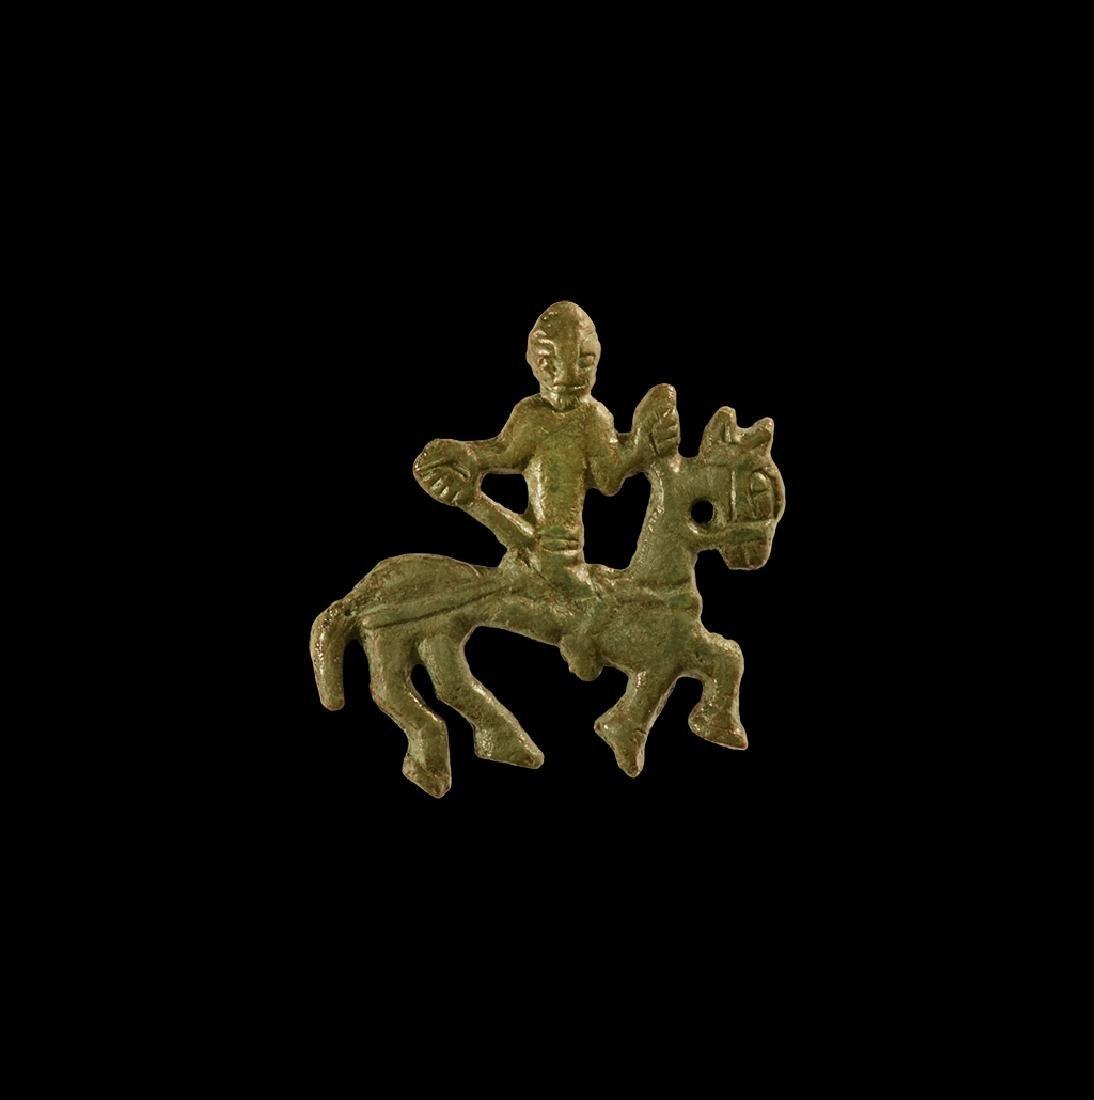 Viking Horse and Rider Applique